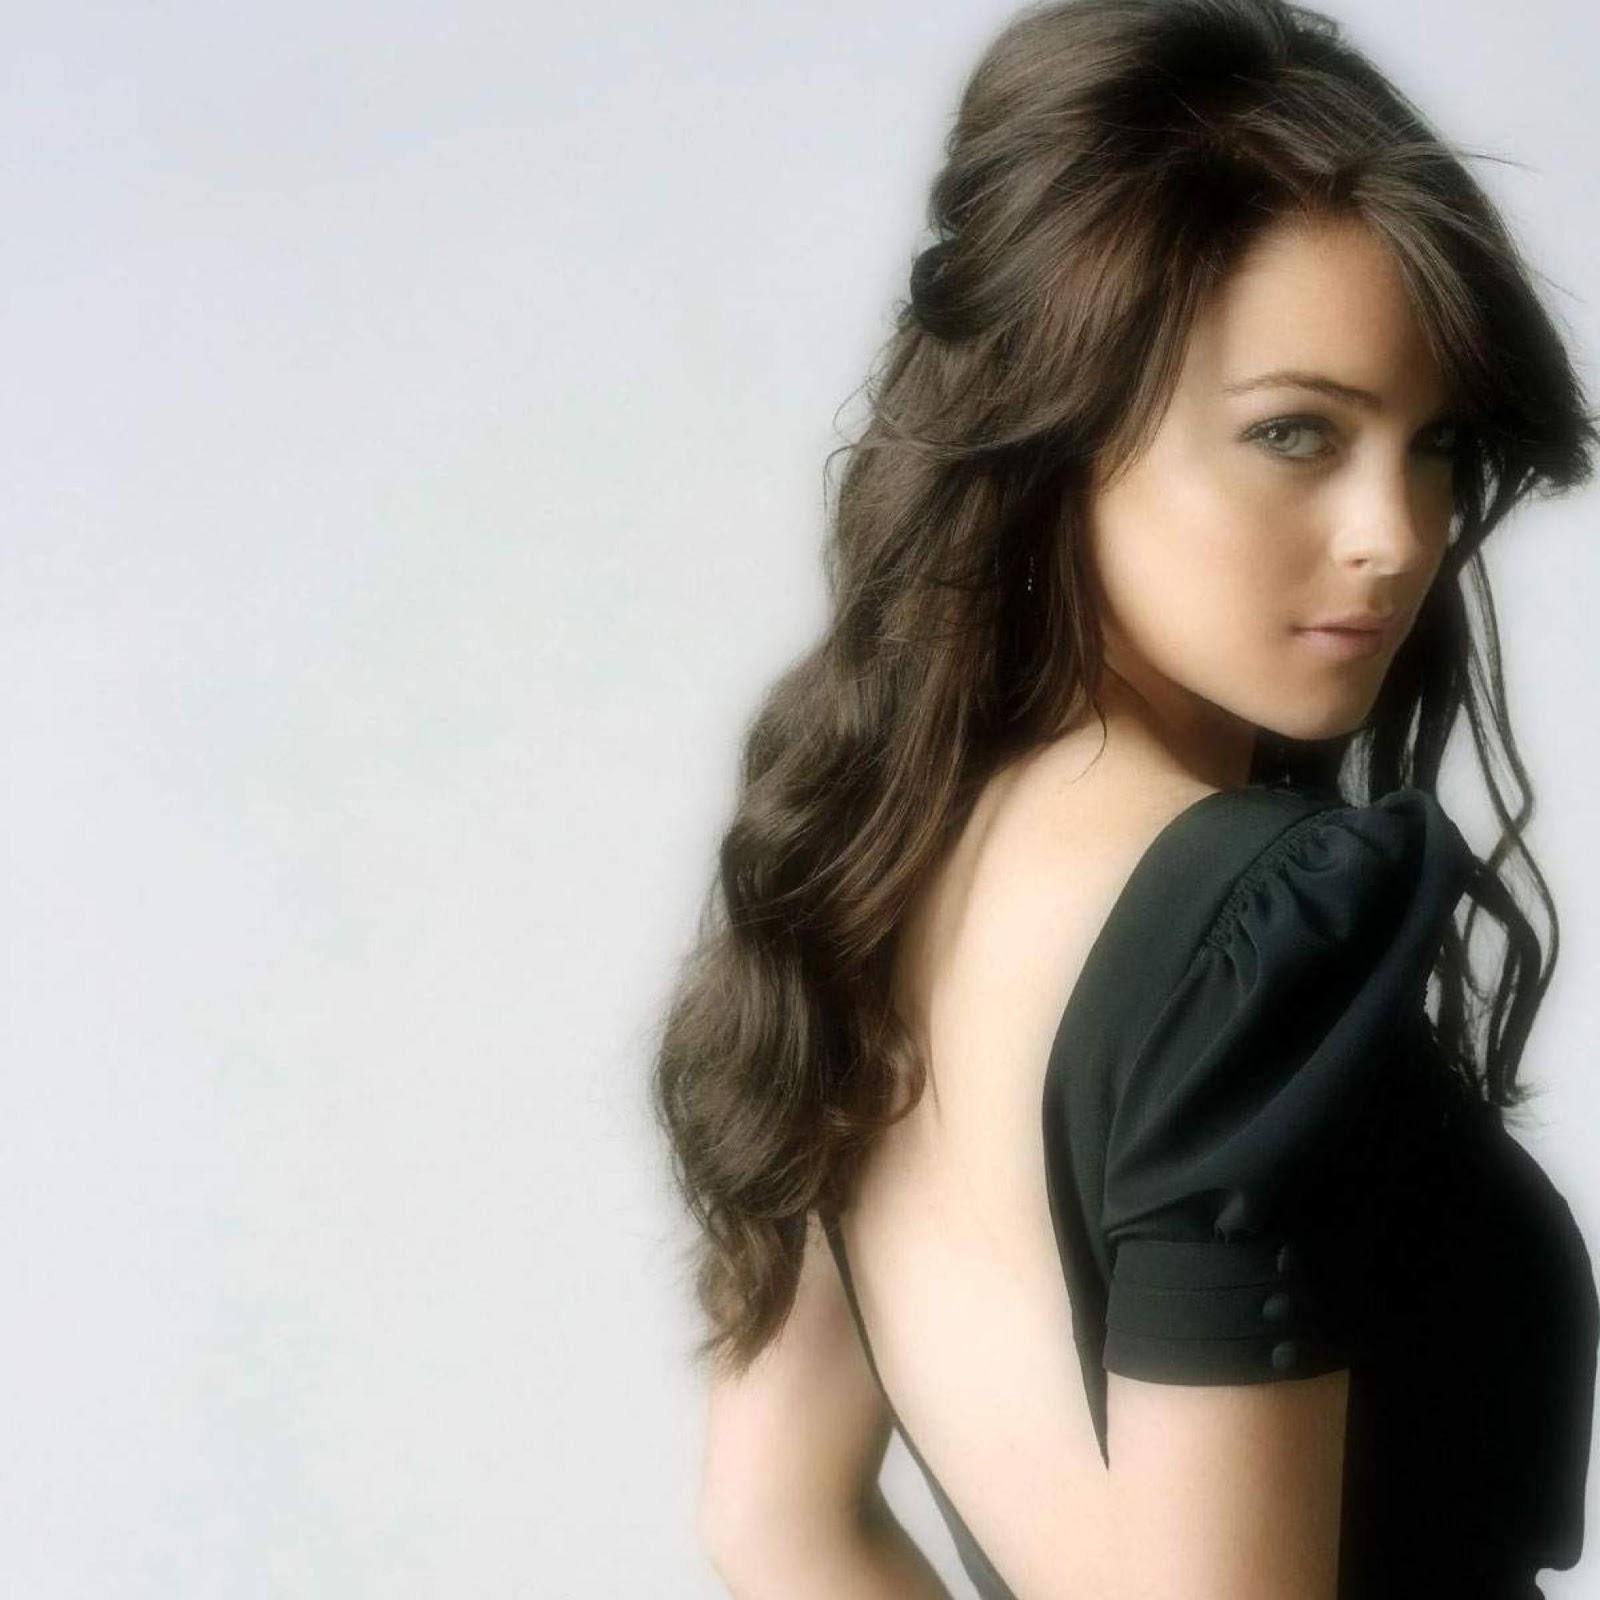 Celebrities IPhone Wallpapers: Lindsay Lohan IPhone Wallpapers